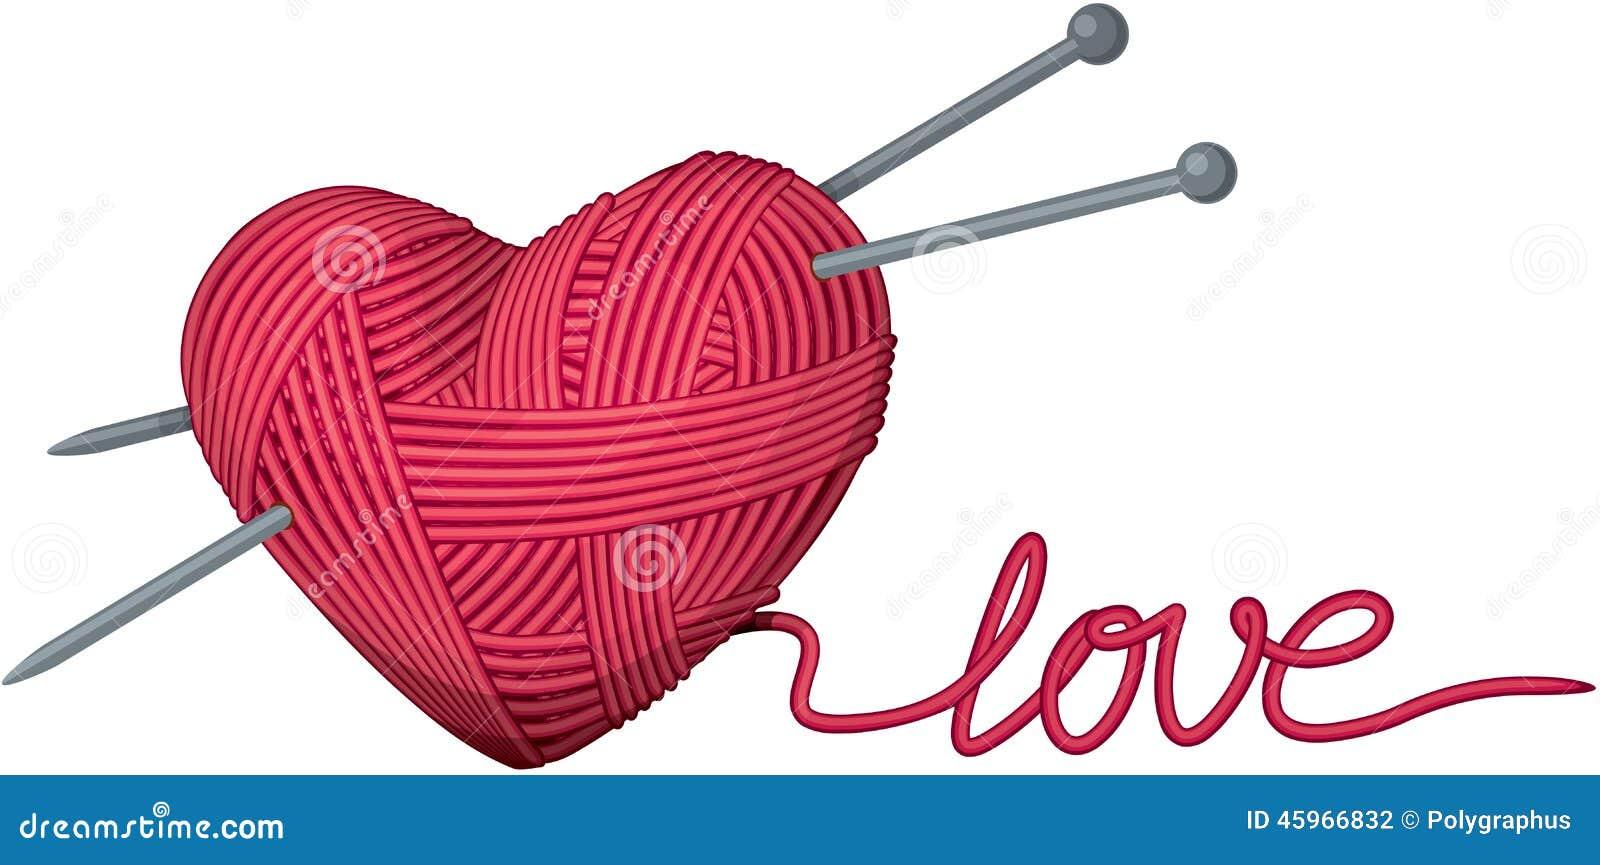 Line Art Love Heart : Heart of yarn stock vector illustration scrawl thread